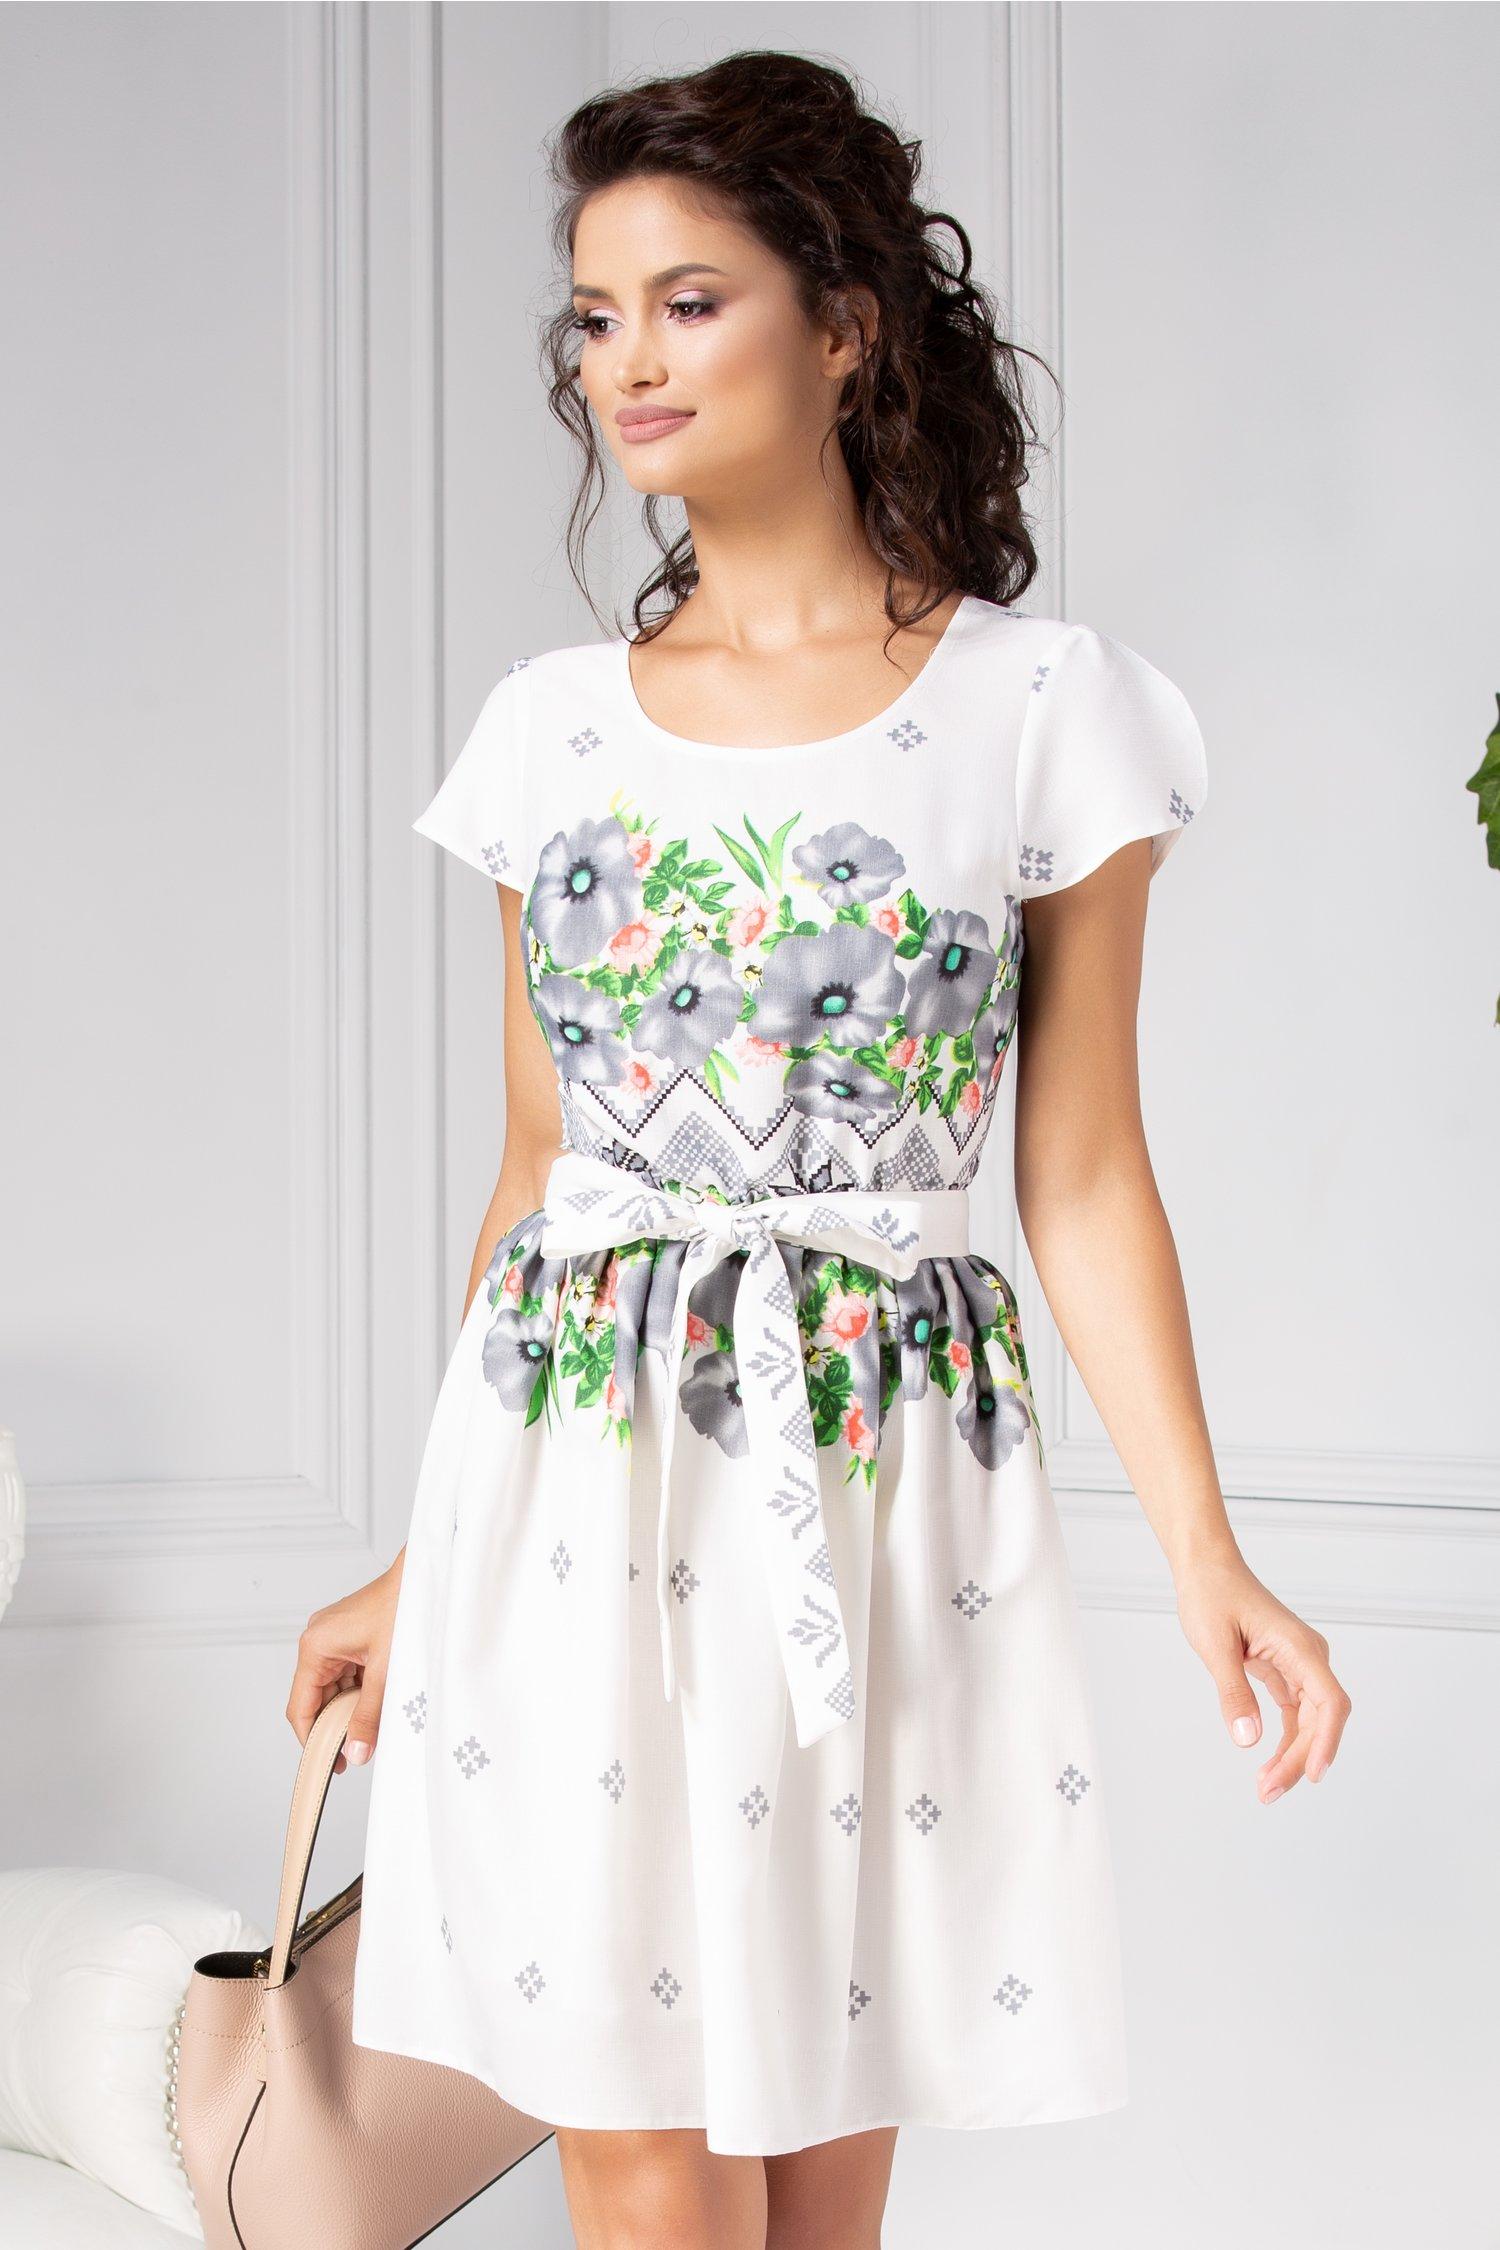 preț atractiv întâlni Adidași 2018 Rochie siena alba cu motive traditionale si flori gri - fashion 4me